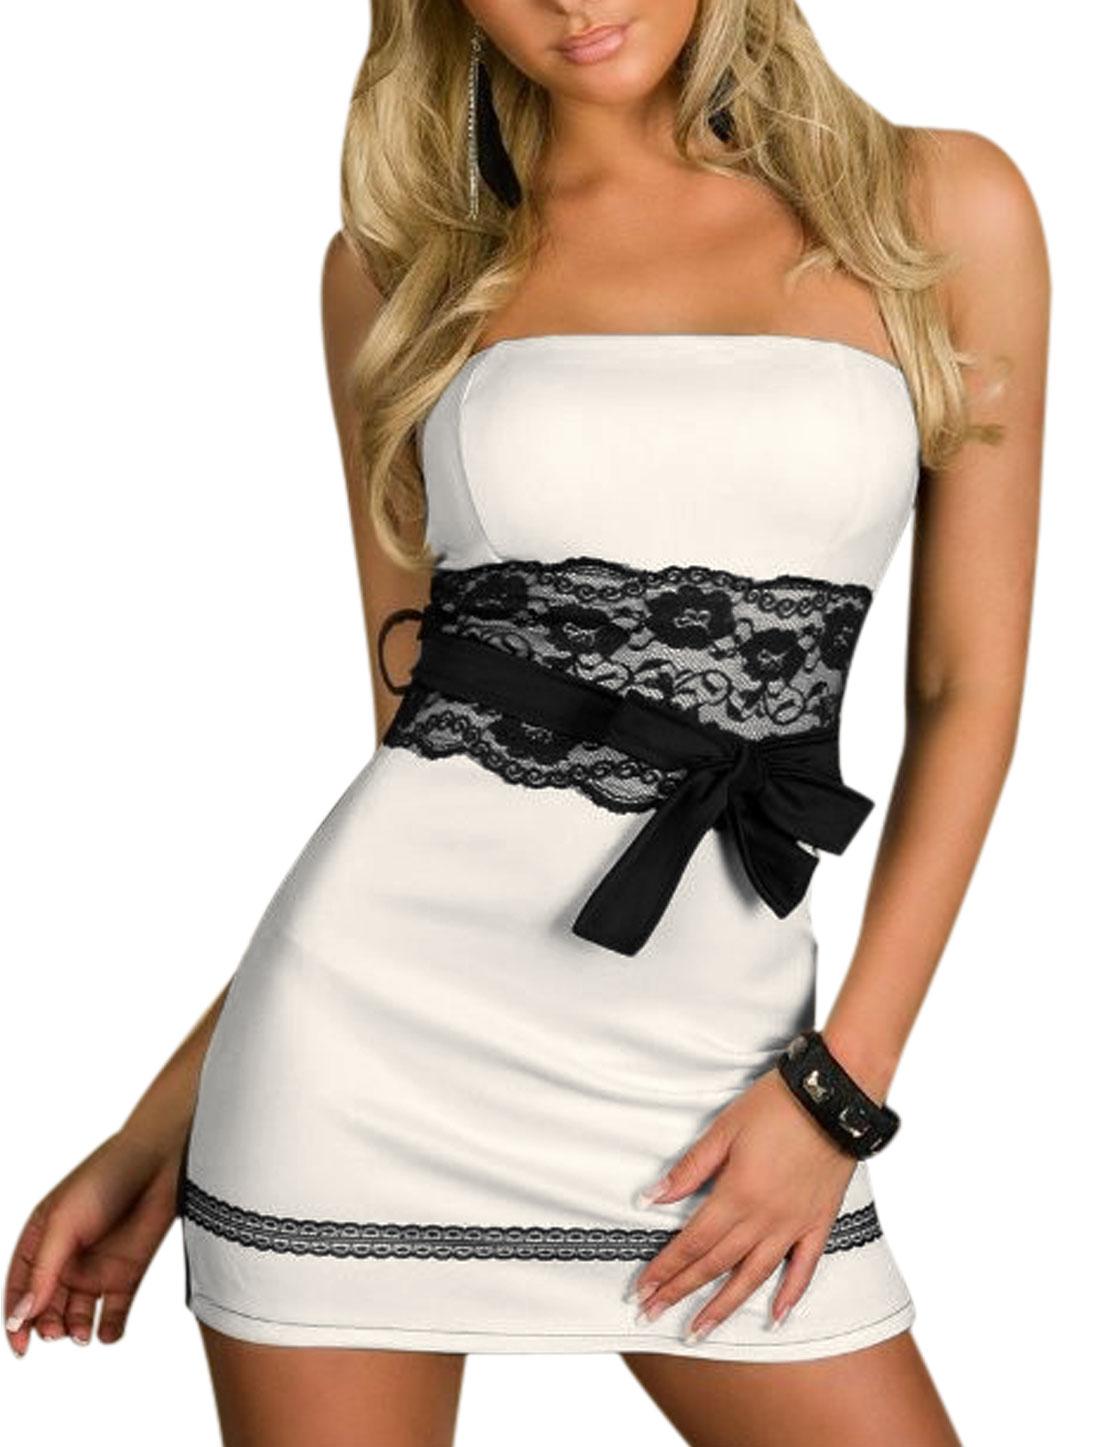 Lady Hidden Zipper Back Mini Strapless Dress w Waist Strap White Black L